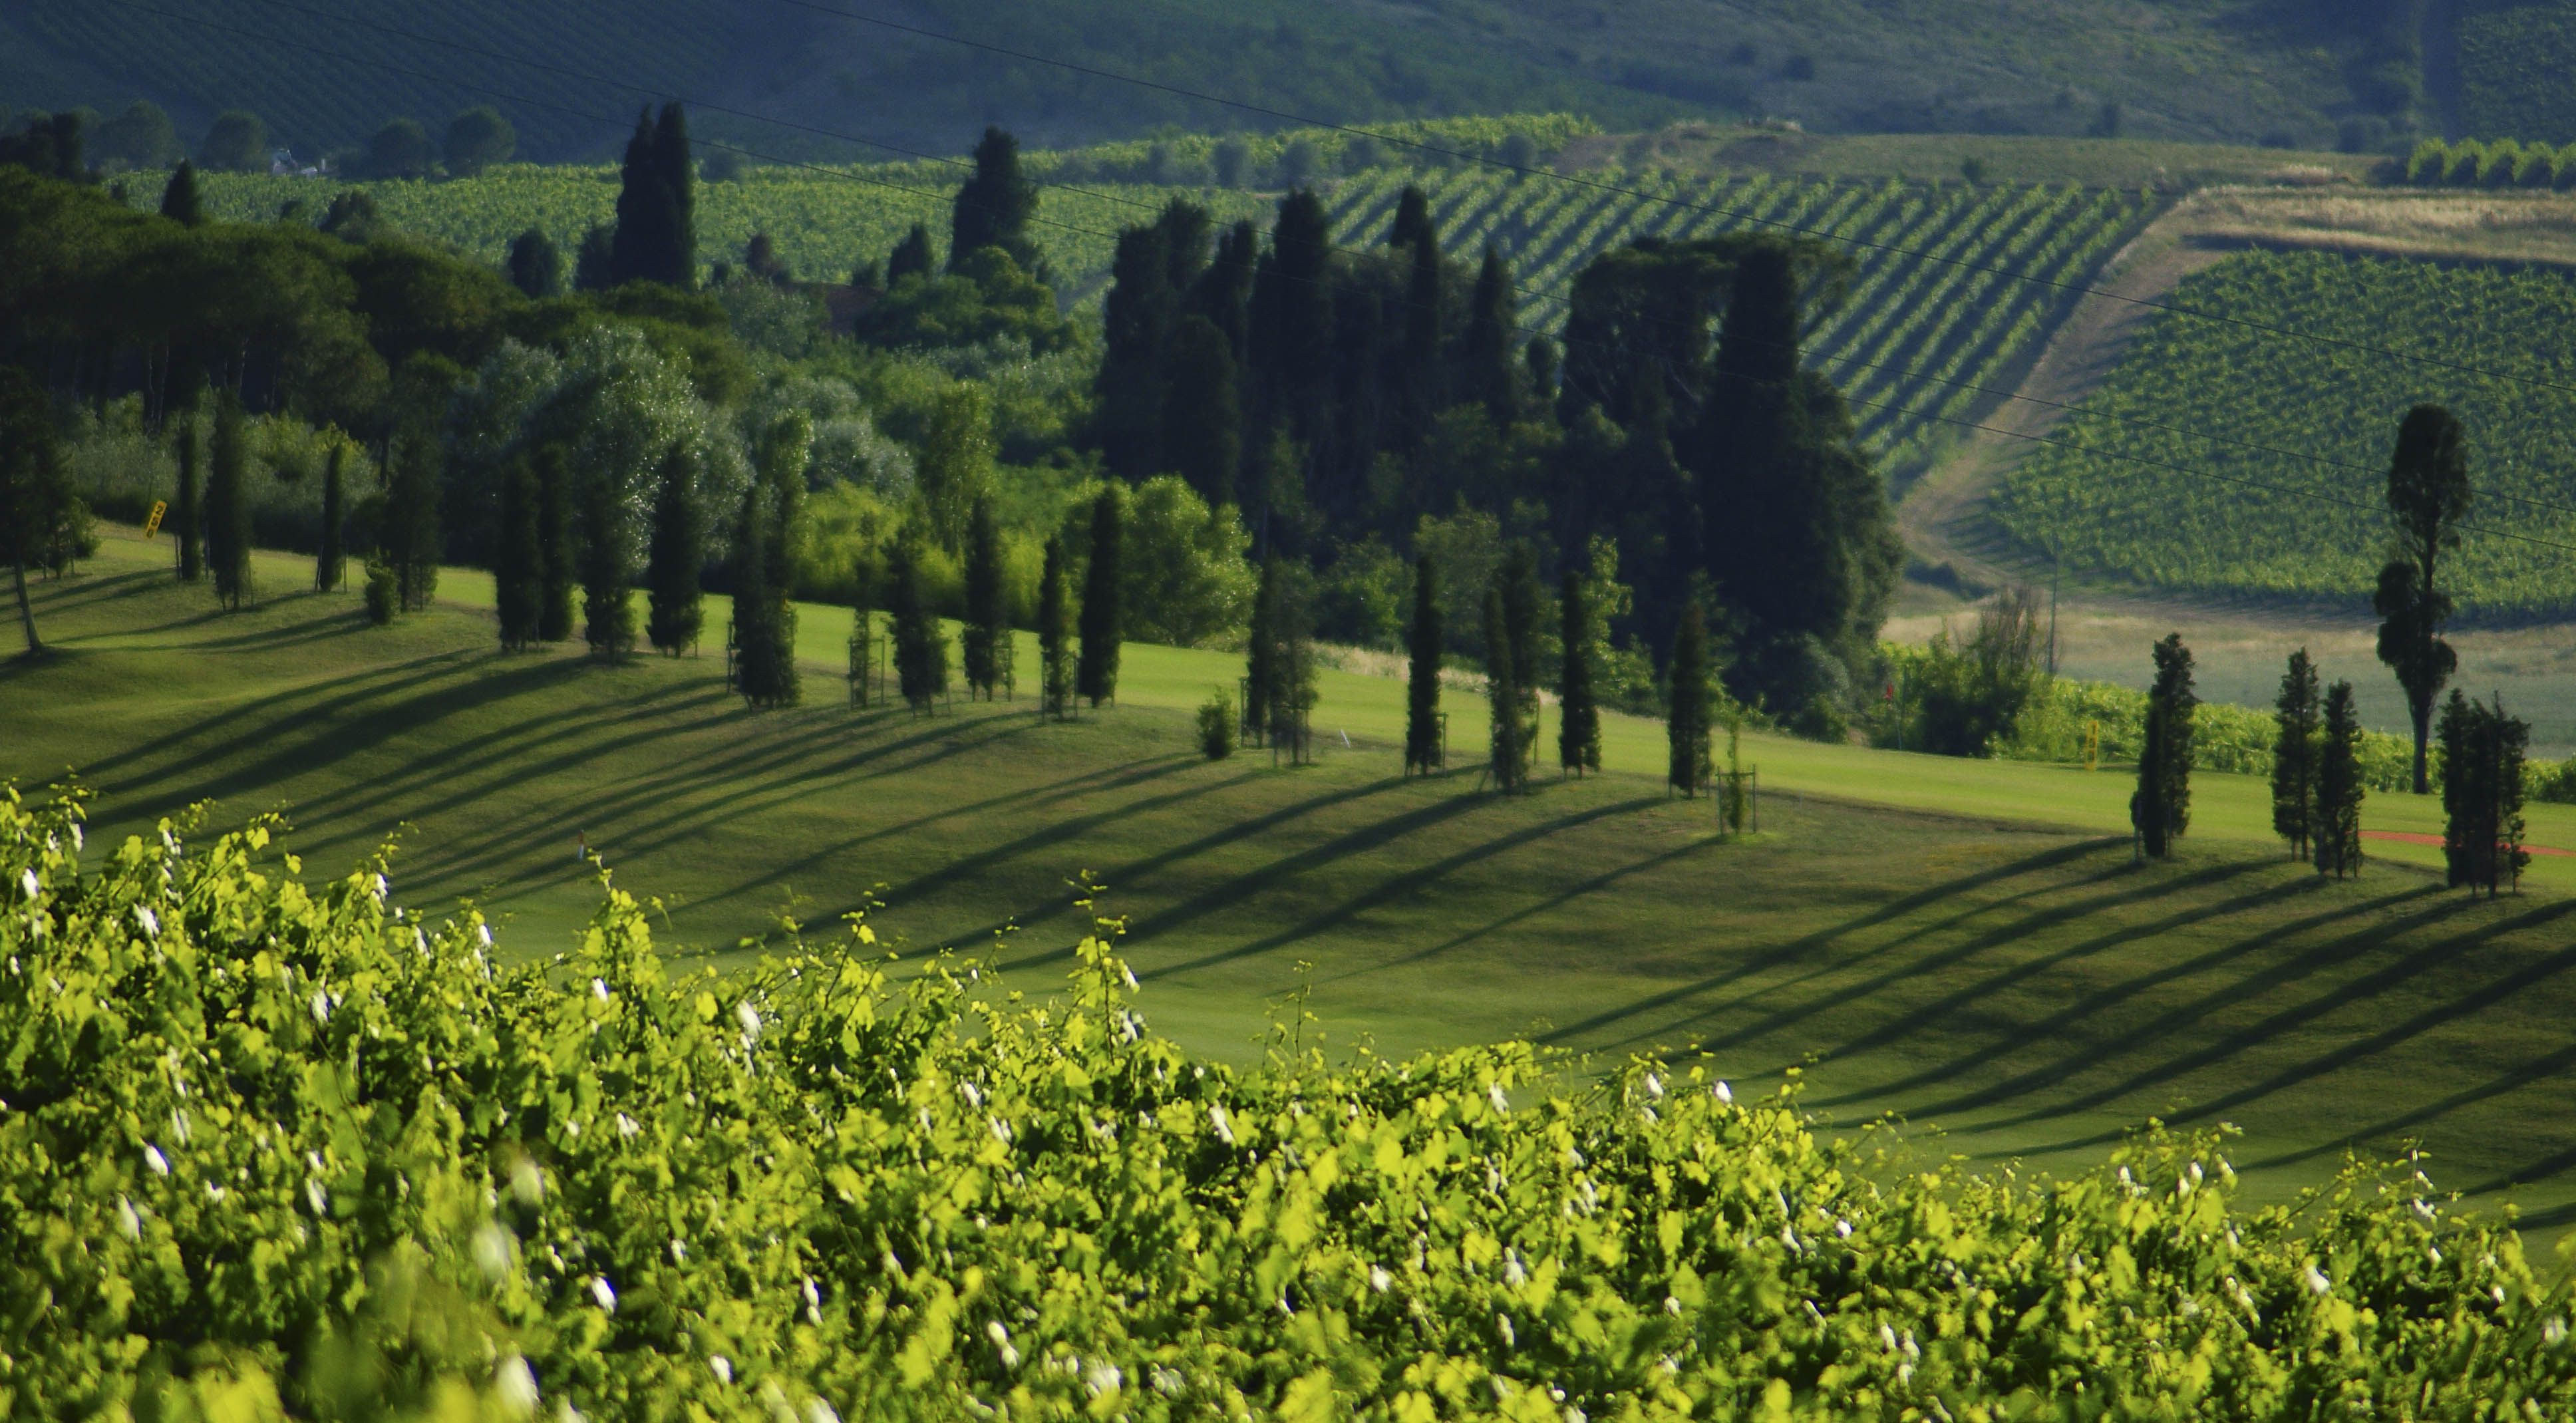 Comune di Vinci; Toscana, 21062015 Toscana